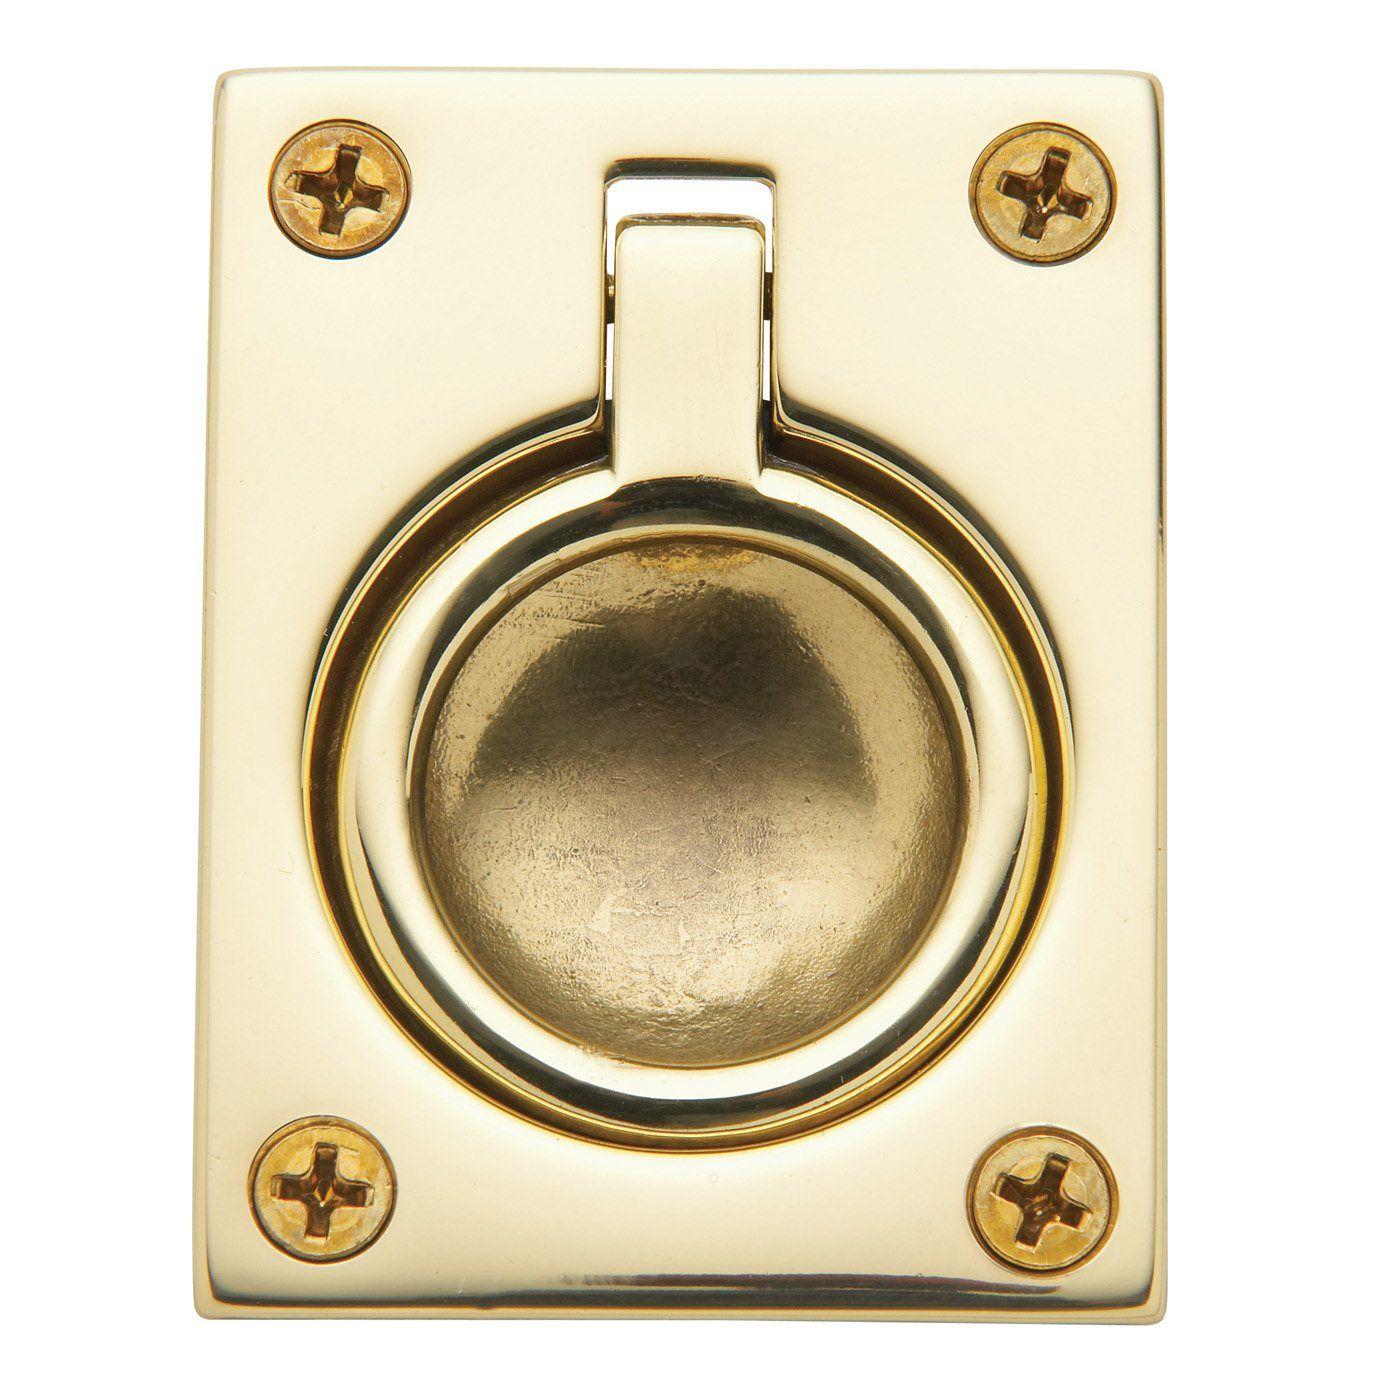 Baldwin Hardware 0394 Flush Ring Pull Pocket Door Hardware